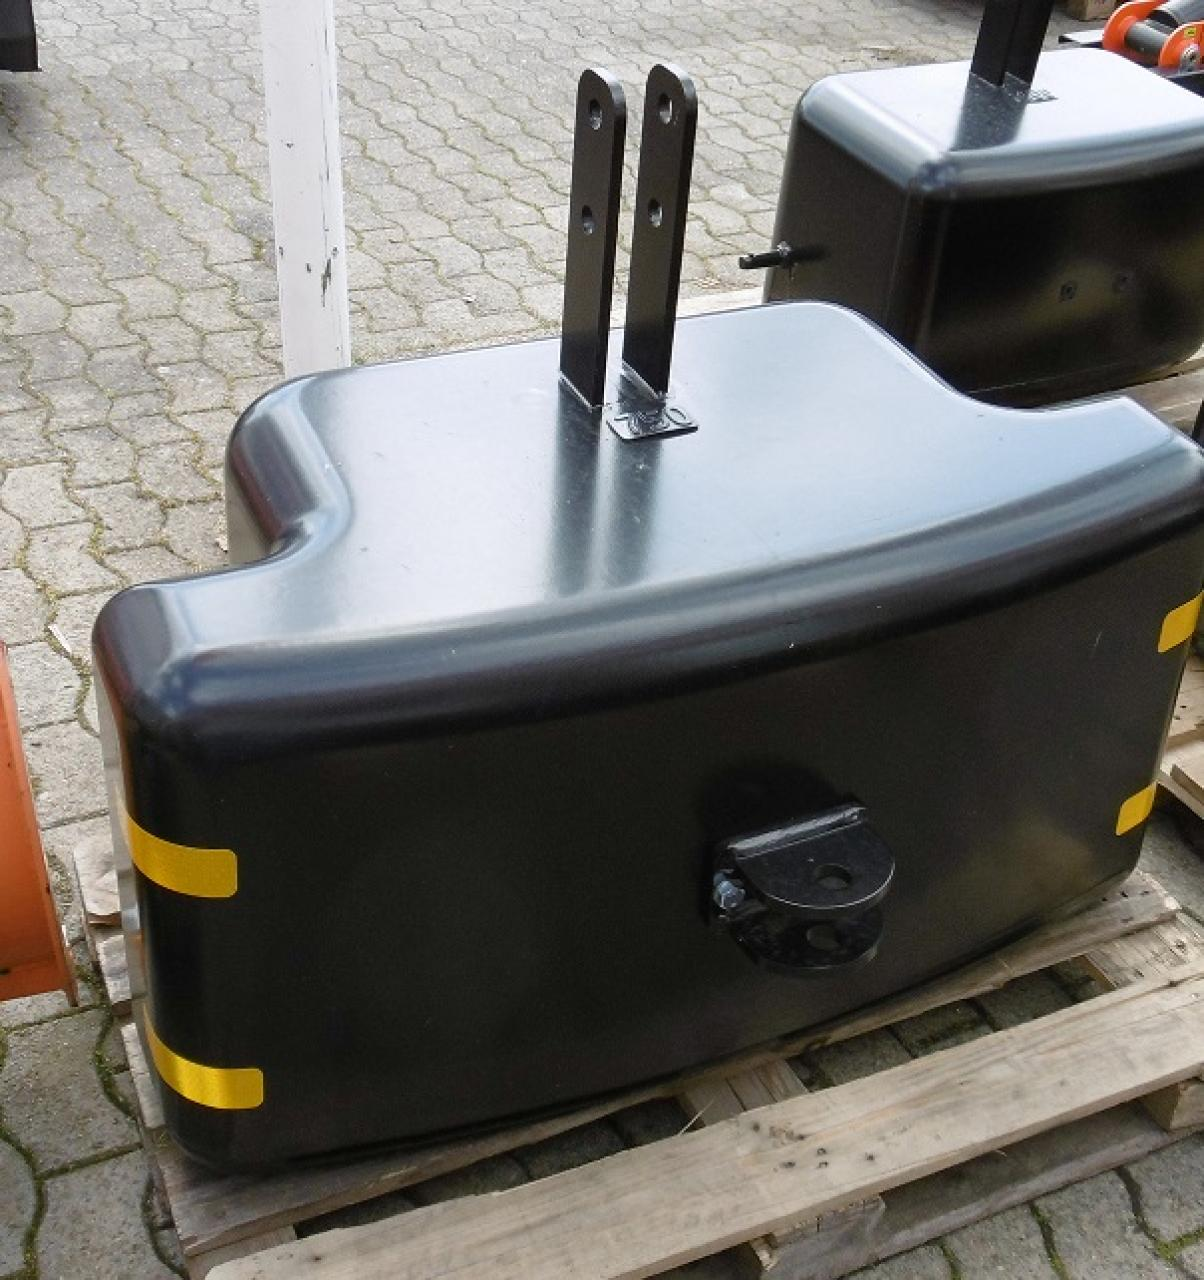 Deutz-Fahr 750 kg Eco-Top